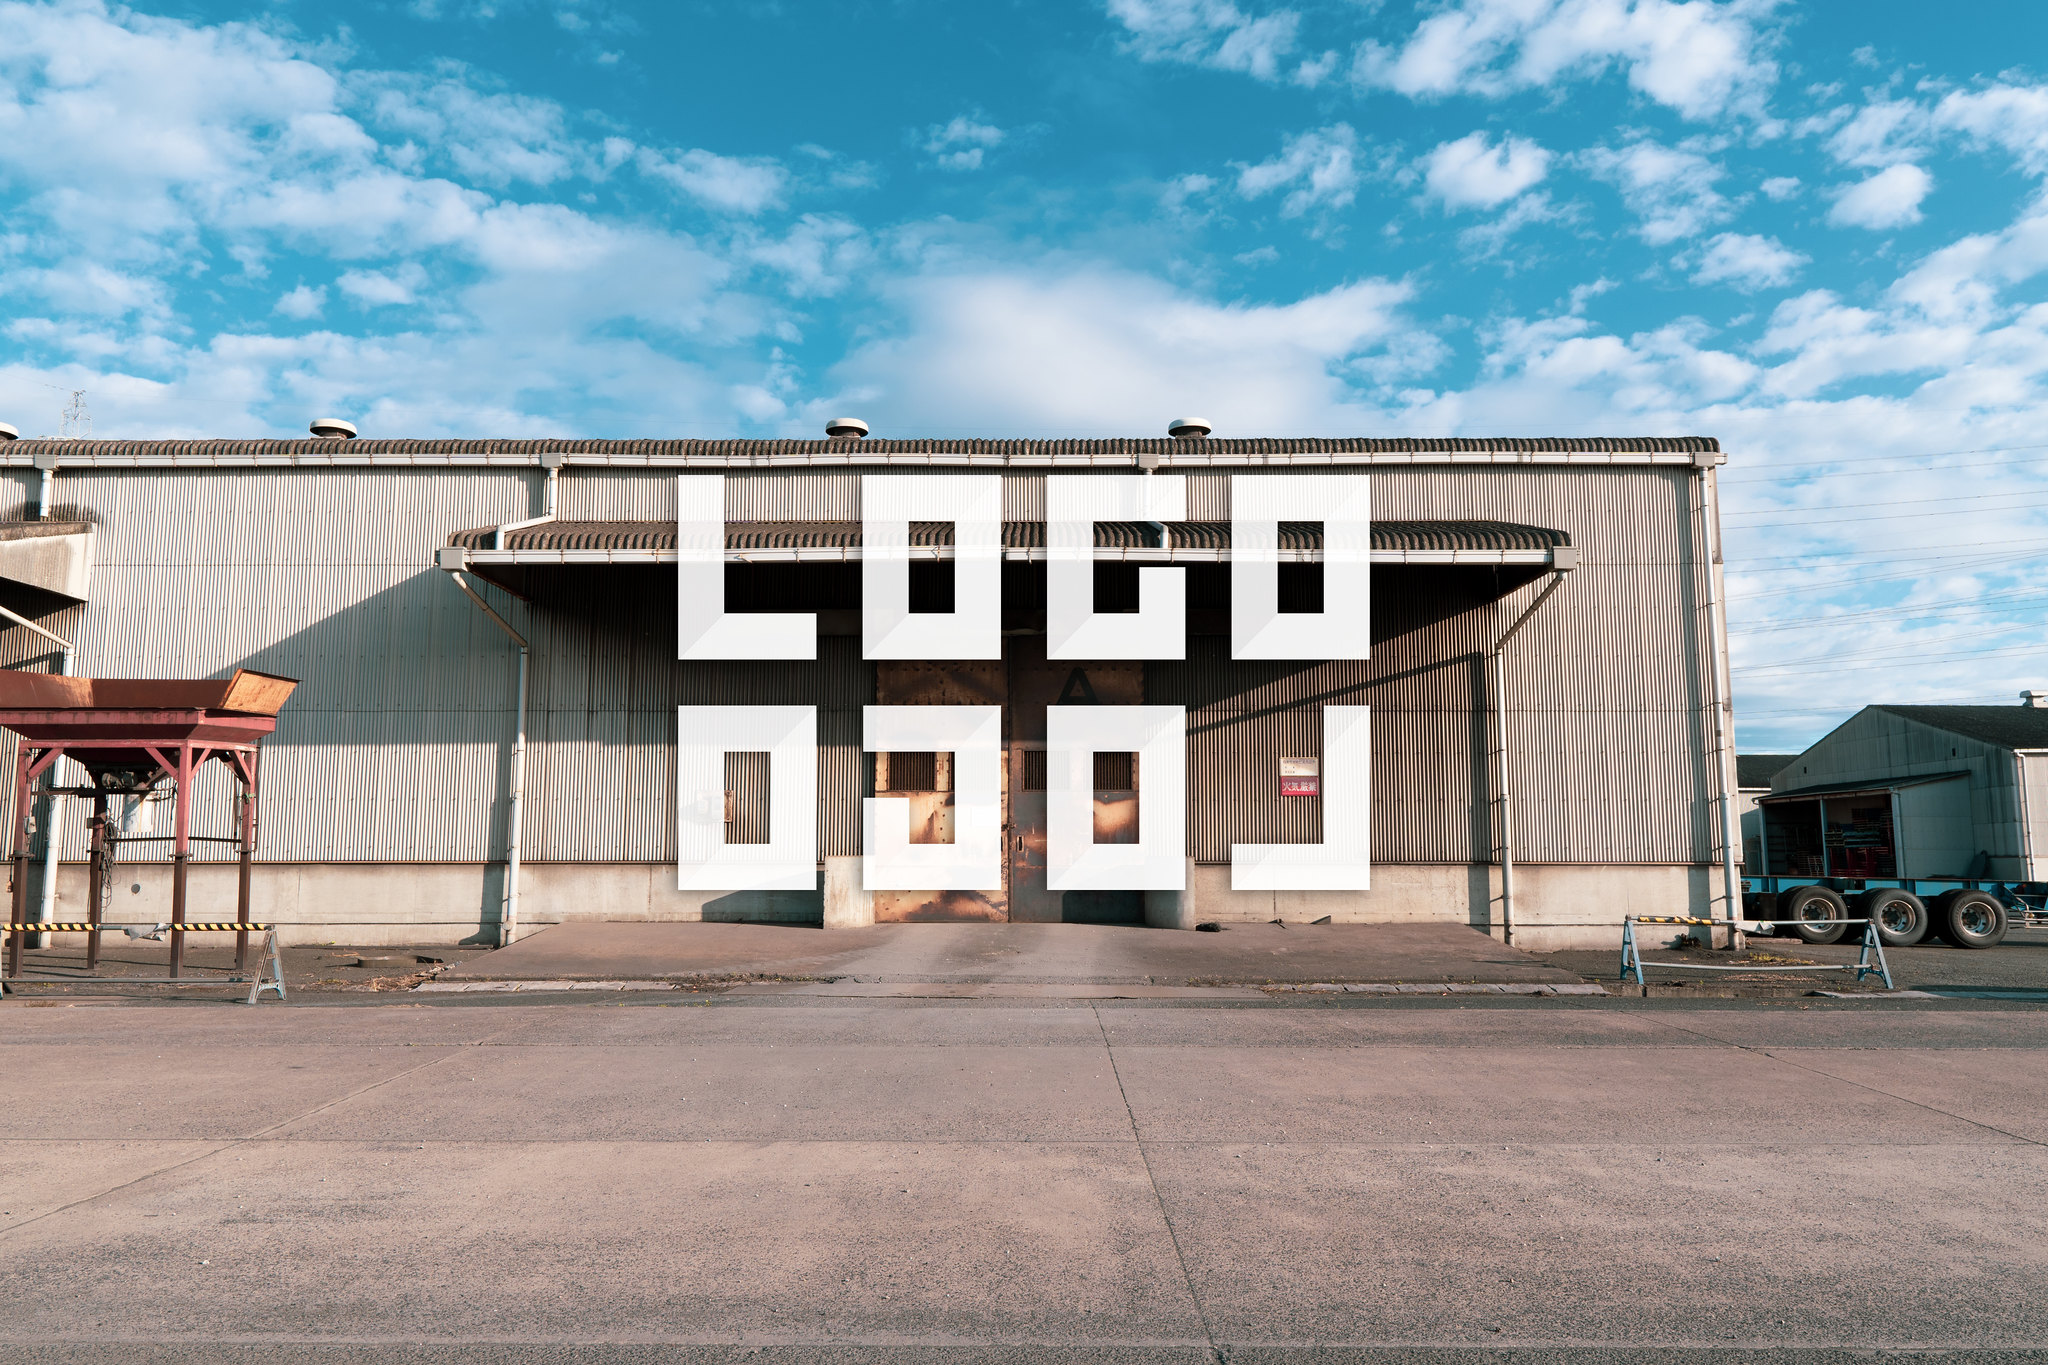 LOGLOGO「ロゴロゴ」用ビジュアル 岡山県倉敷市水島港玉島エリアの倉庫